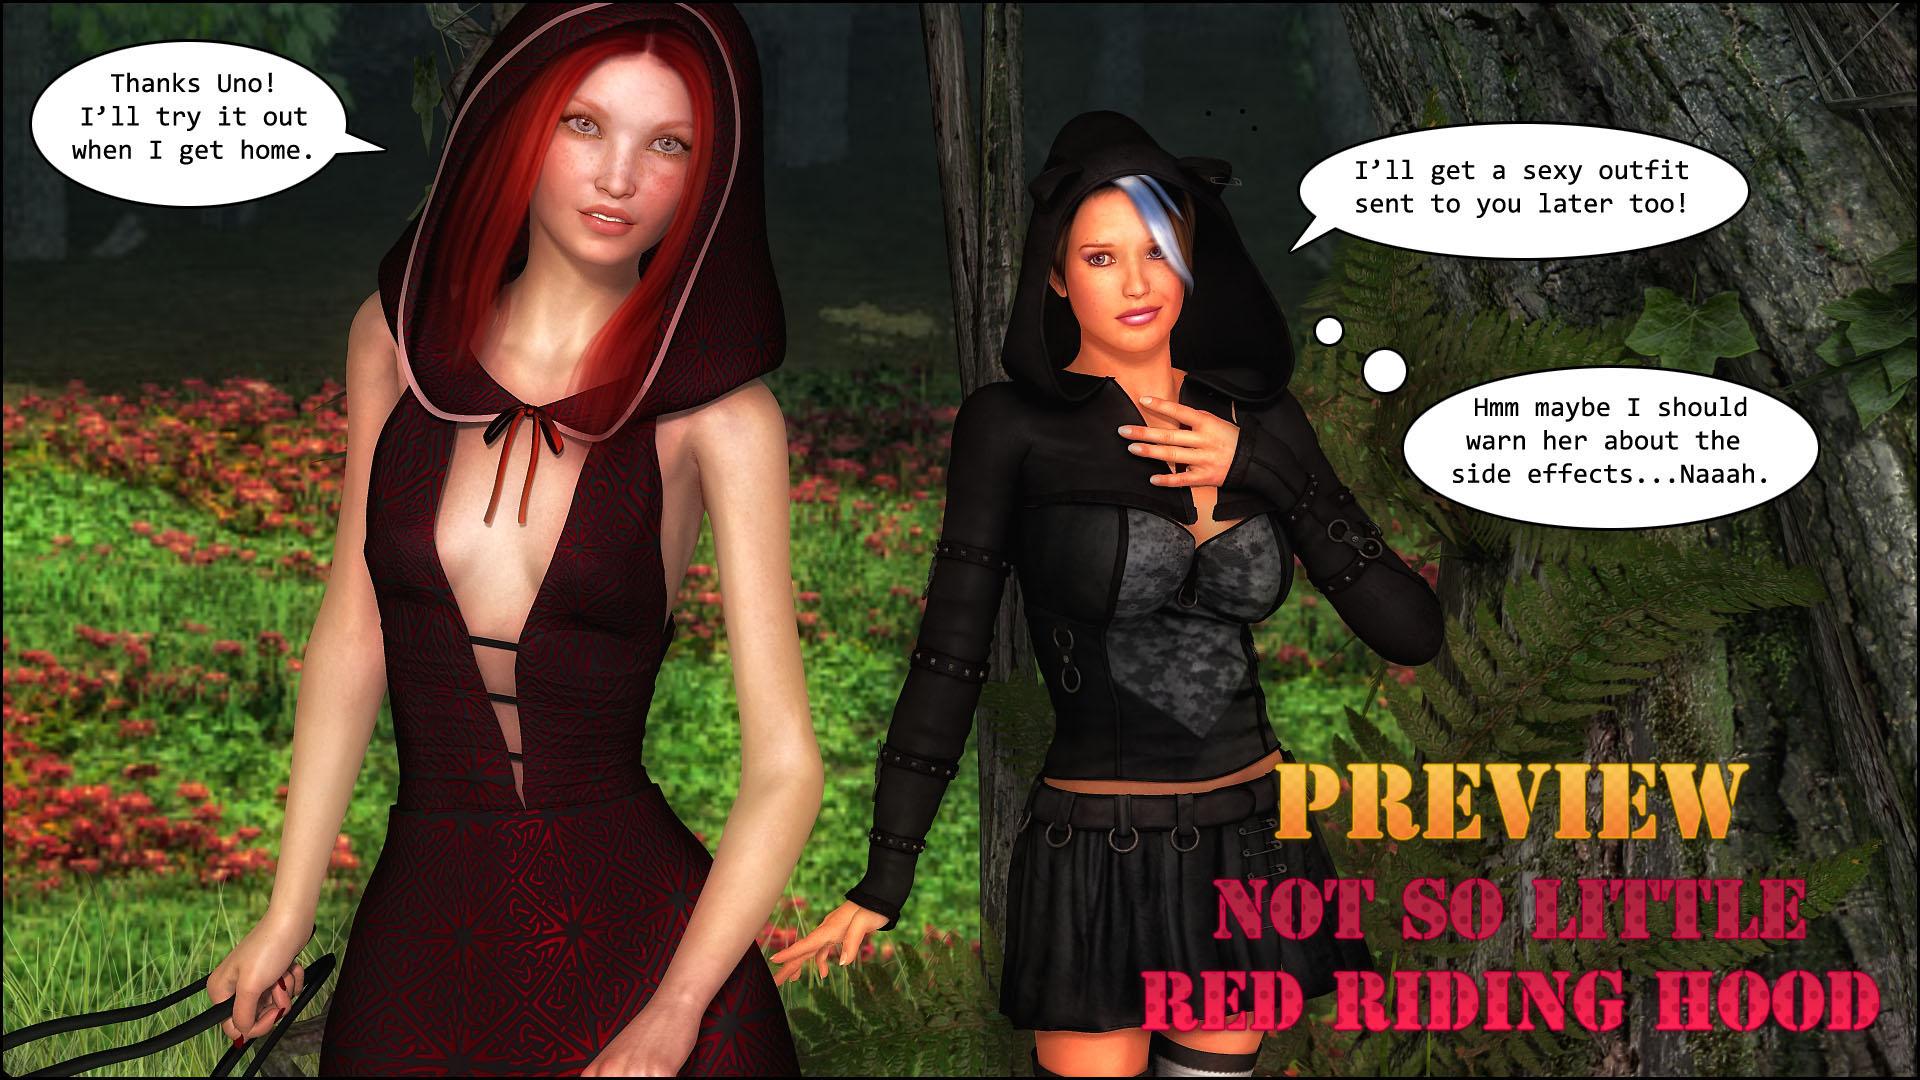 Worksheet Little Red Riding Hood 2 little red riding hood deviantart images guru by not so red